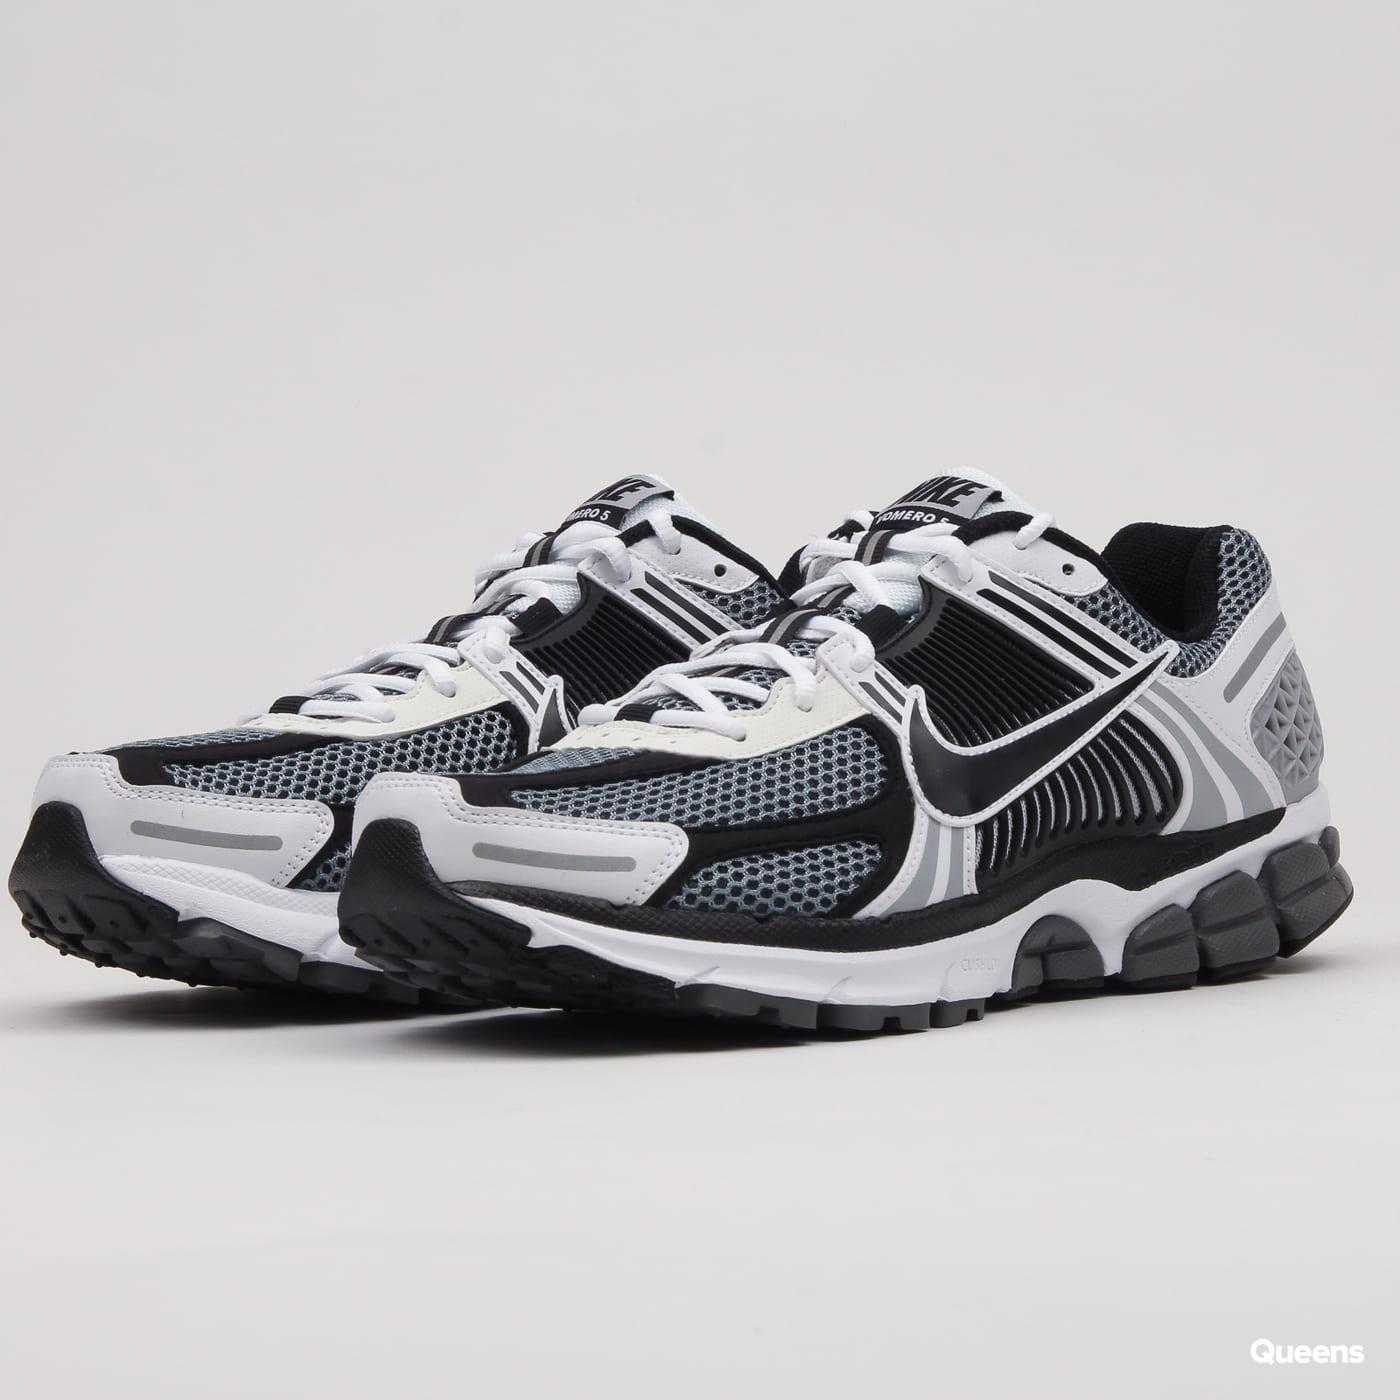 Sneakers Nike Zoom Vomero 5 SE SP dark